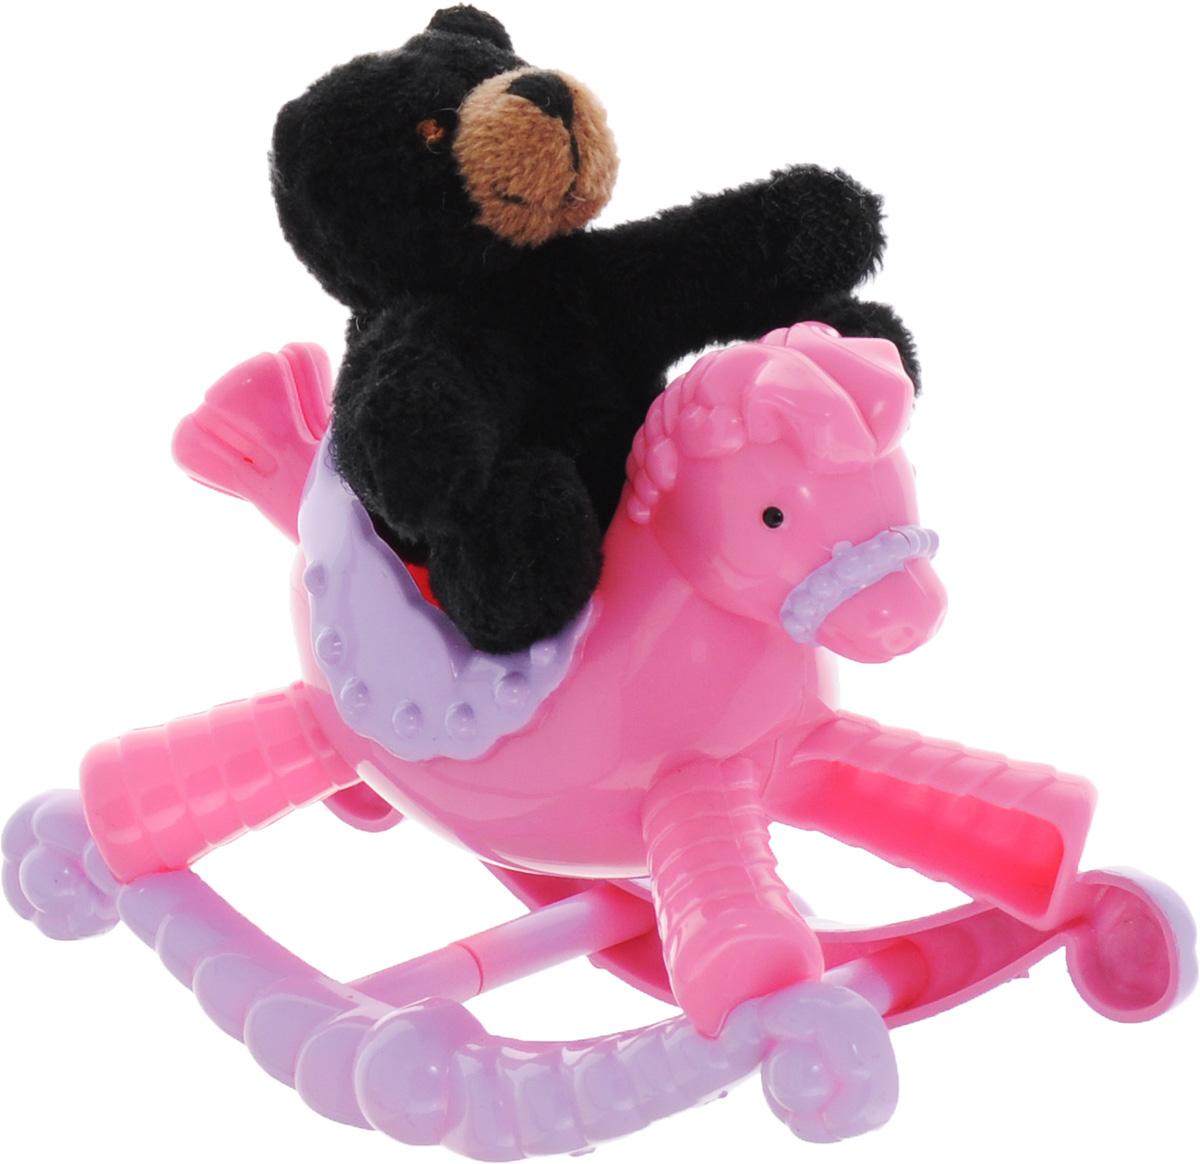 Beanzees Мягкая игрушка Медвежонок Boo 5 см